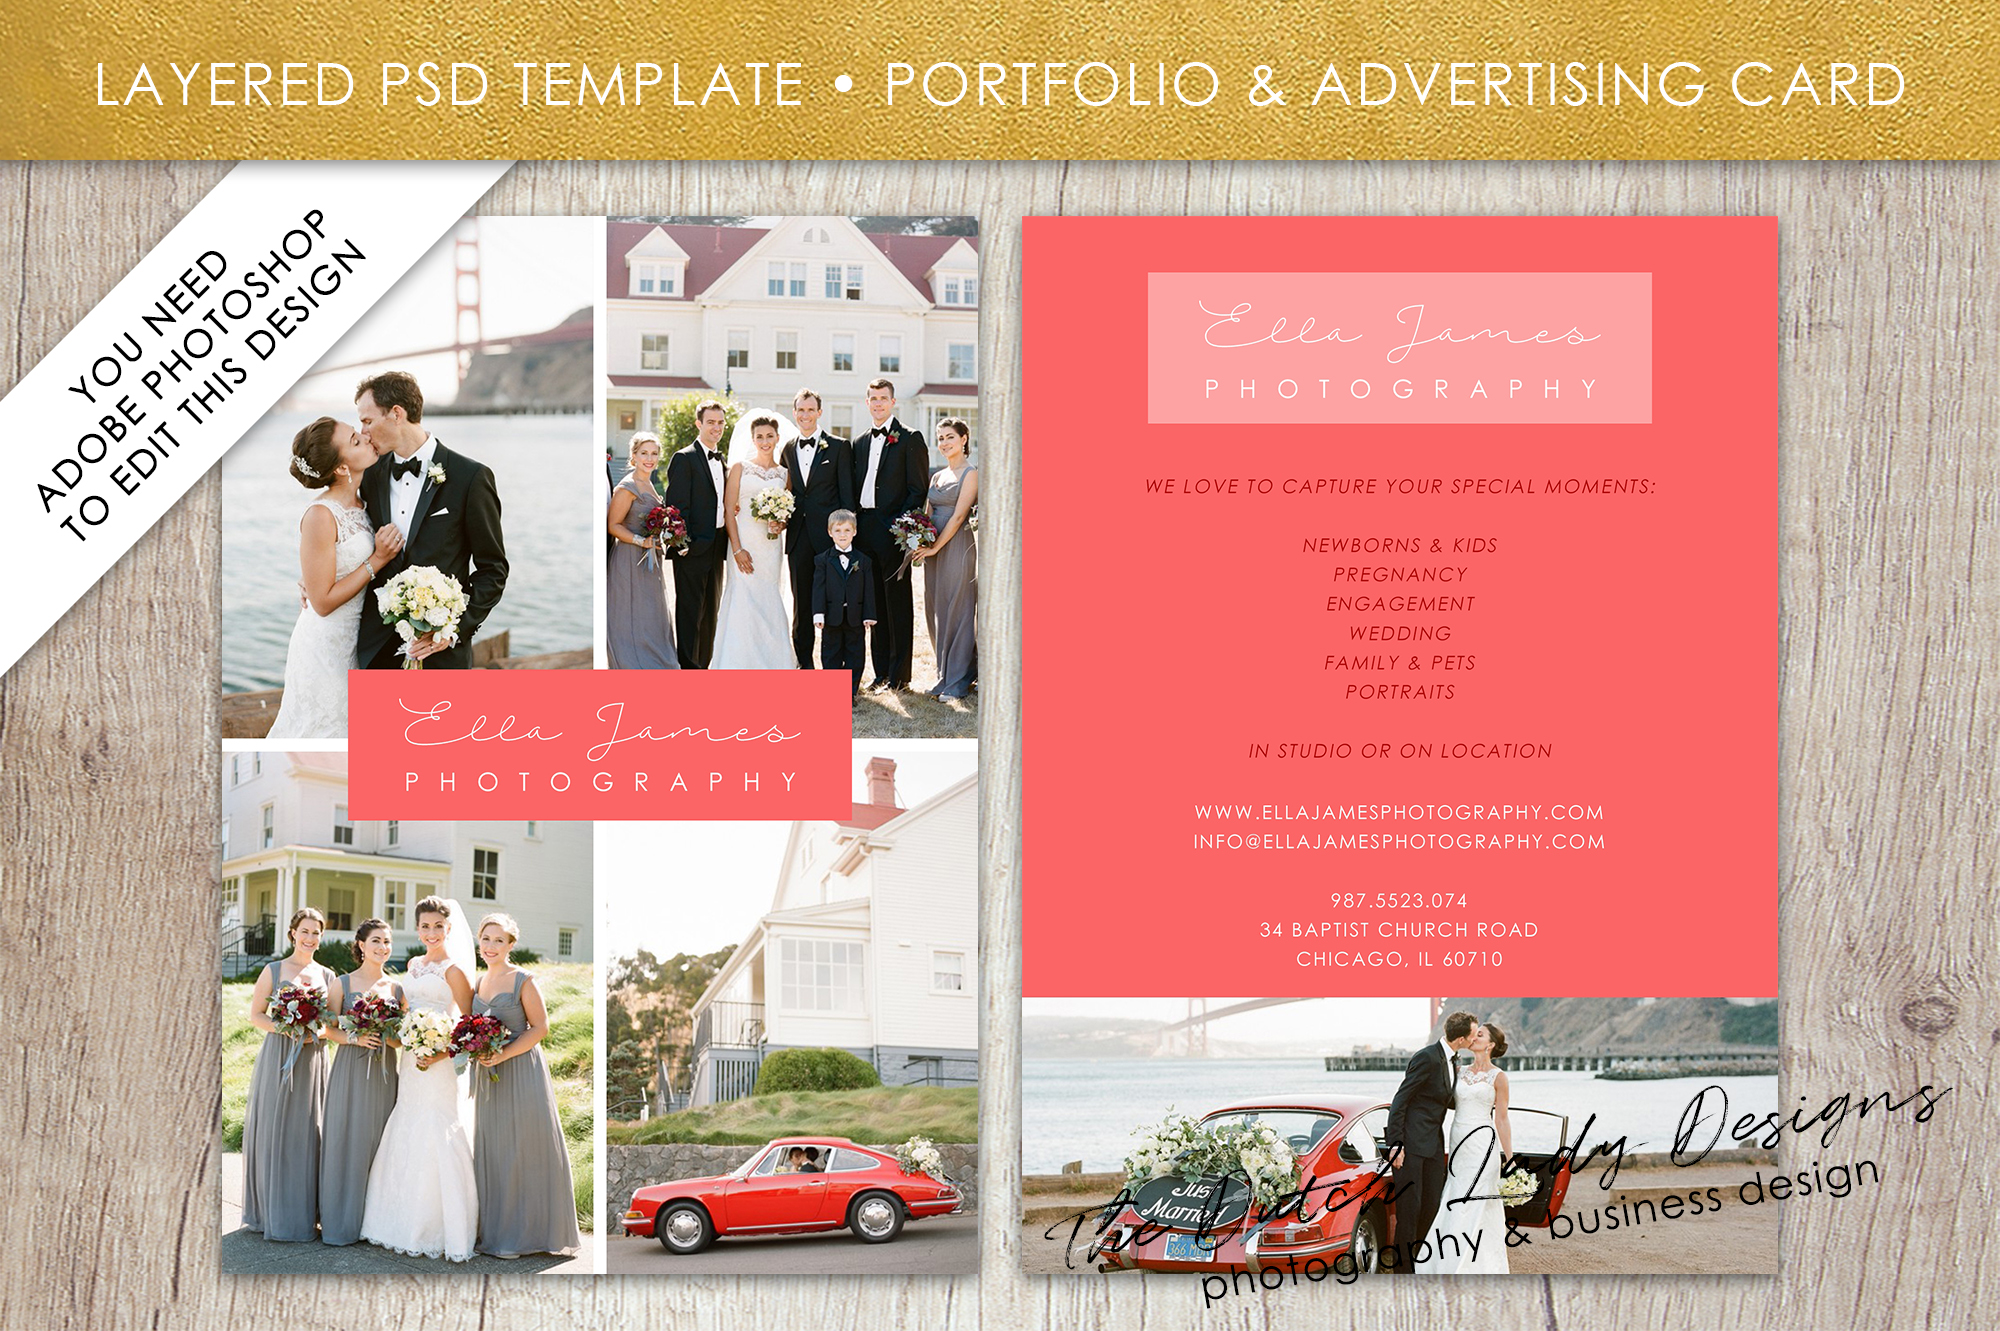 Photo Portfolio & Advertising Card Temp | Design Bundles